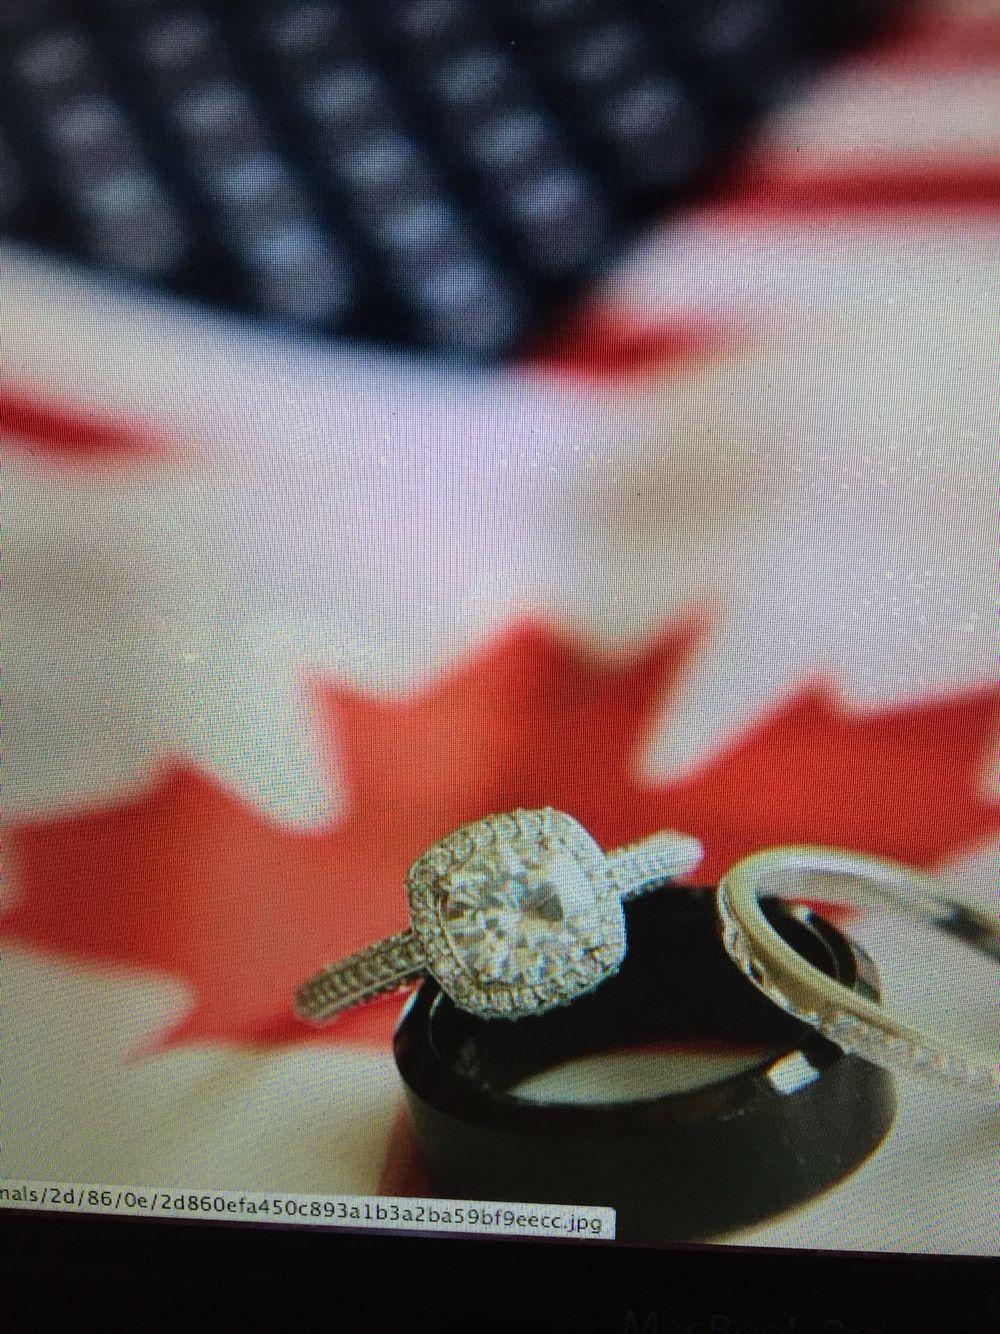 Engagement photos | Jamaica Destination Wedding Ideas | Pinterest ...